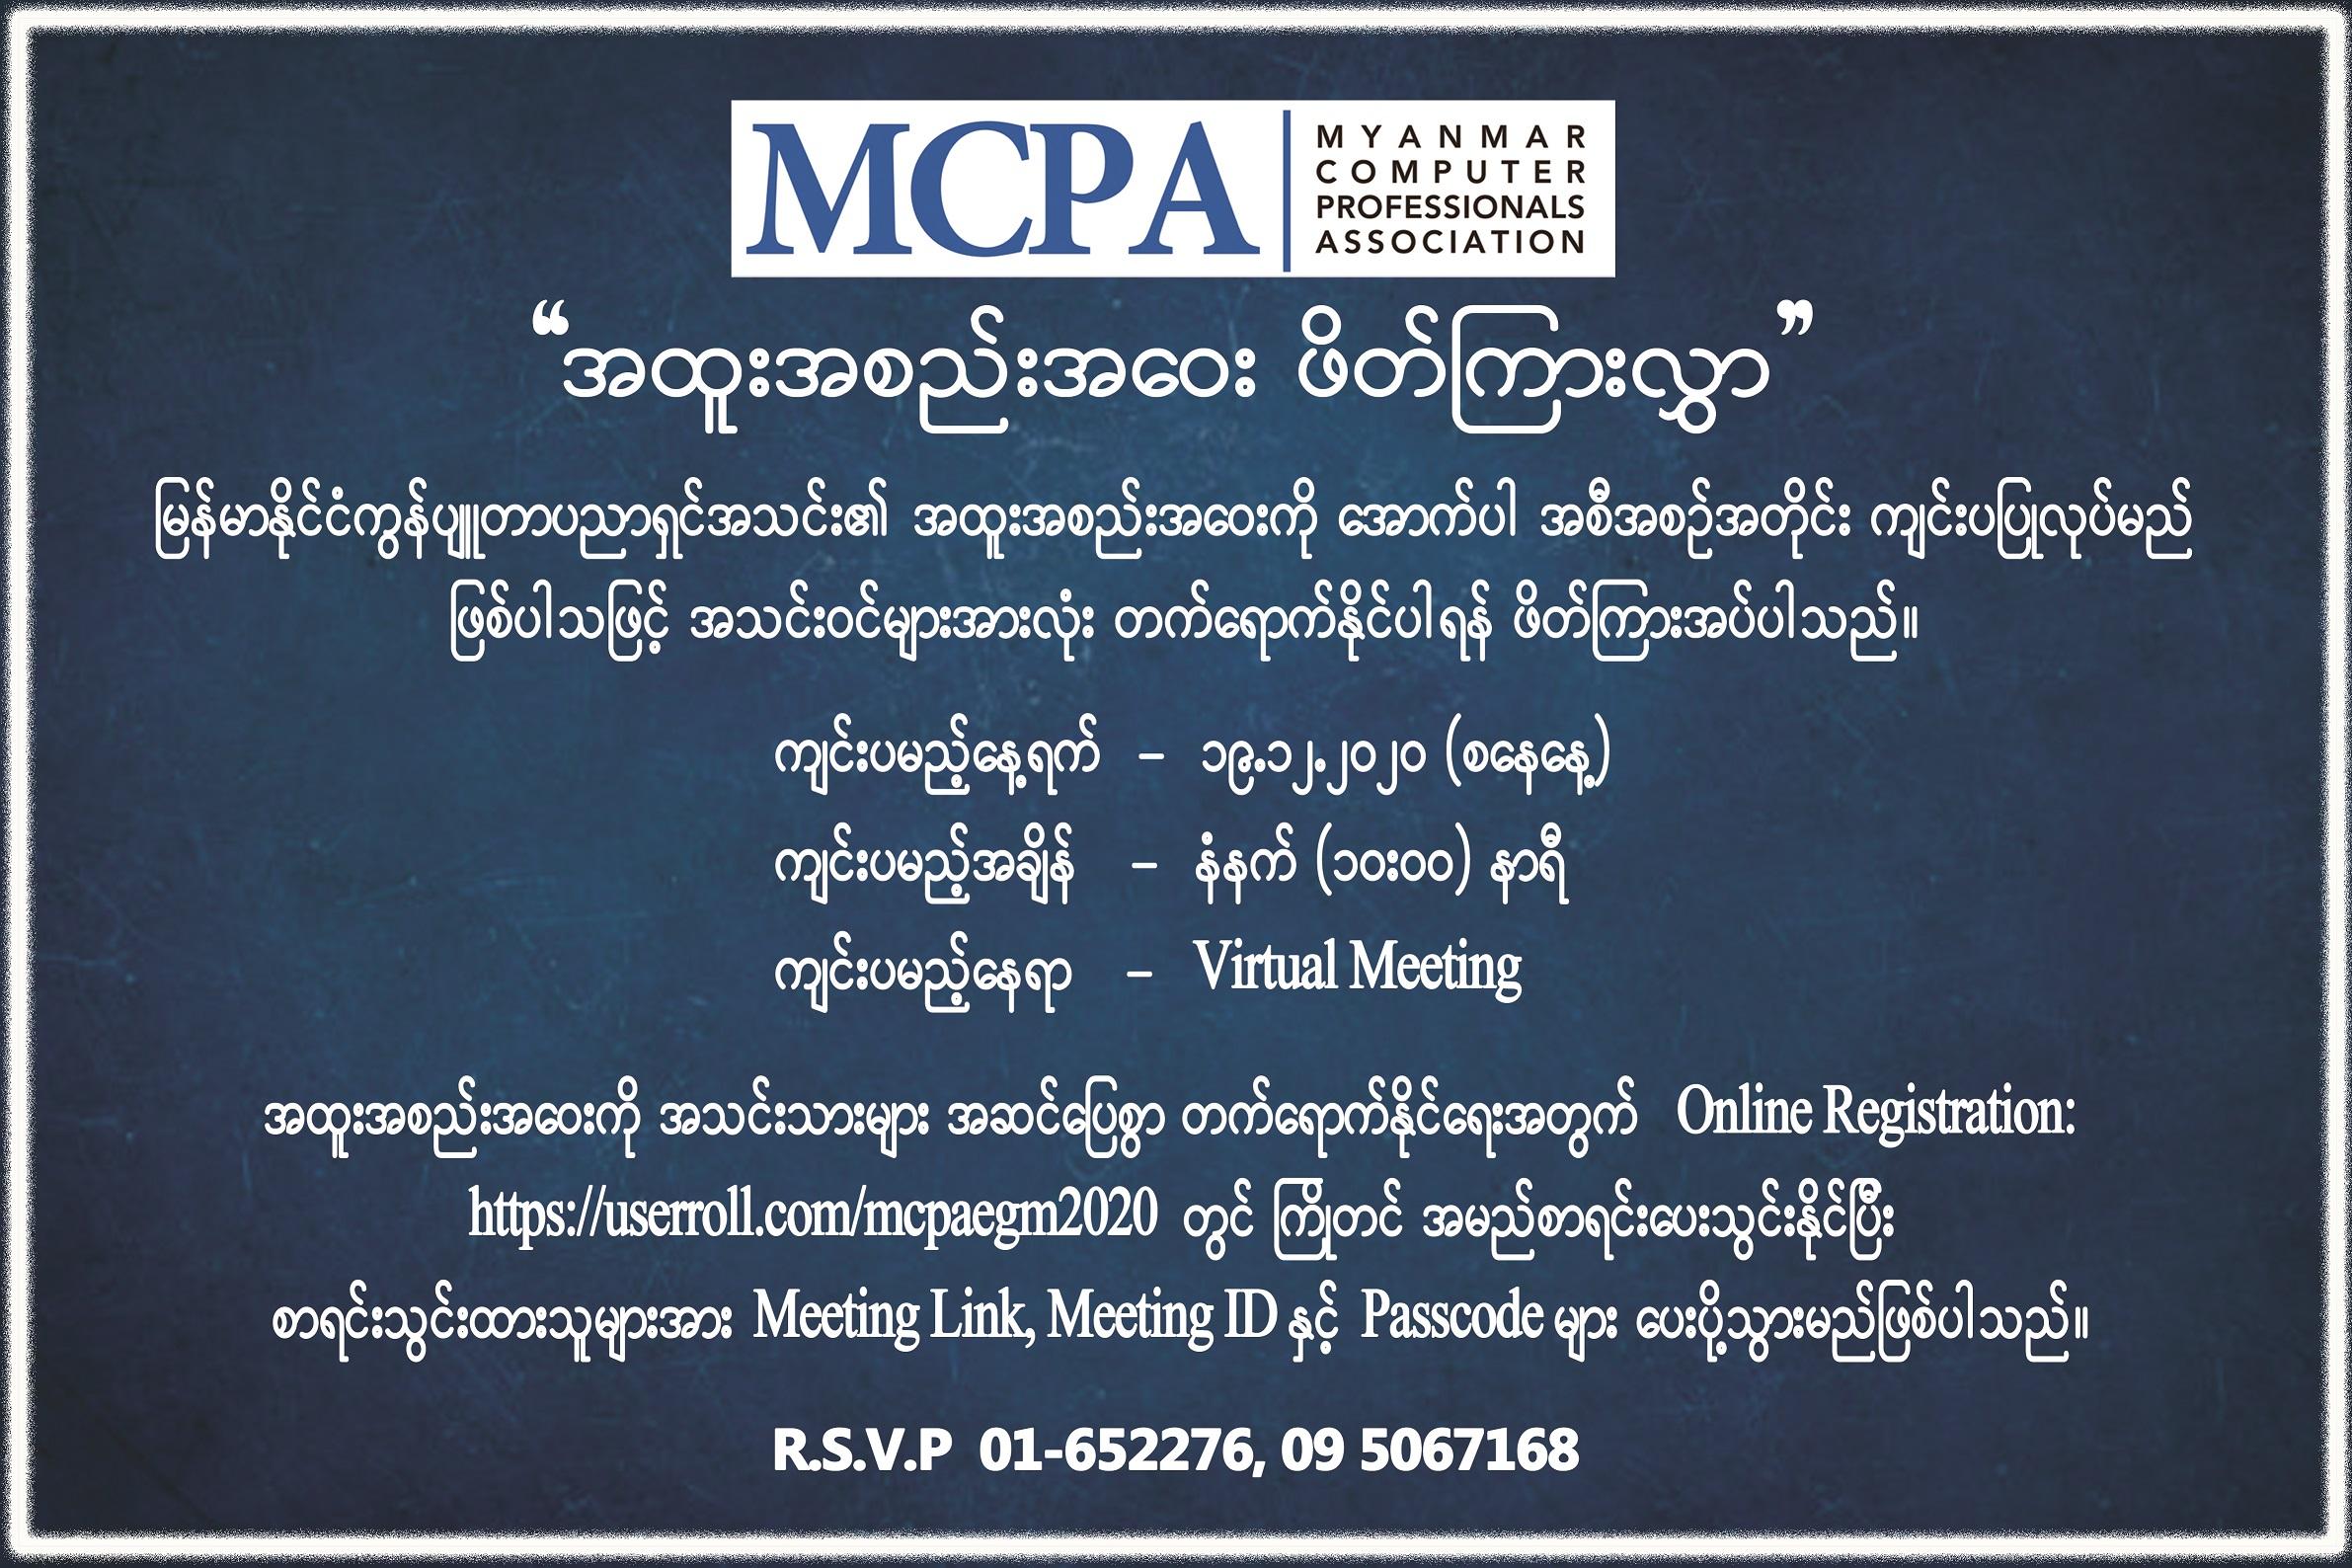 MCPA EGM 2020 Banner Image